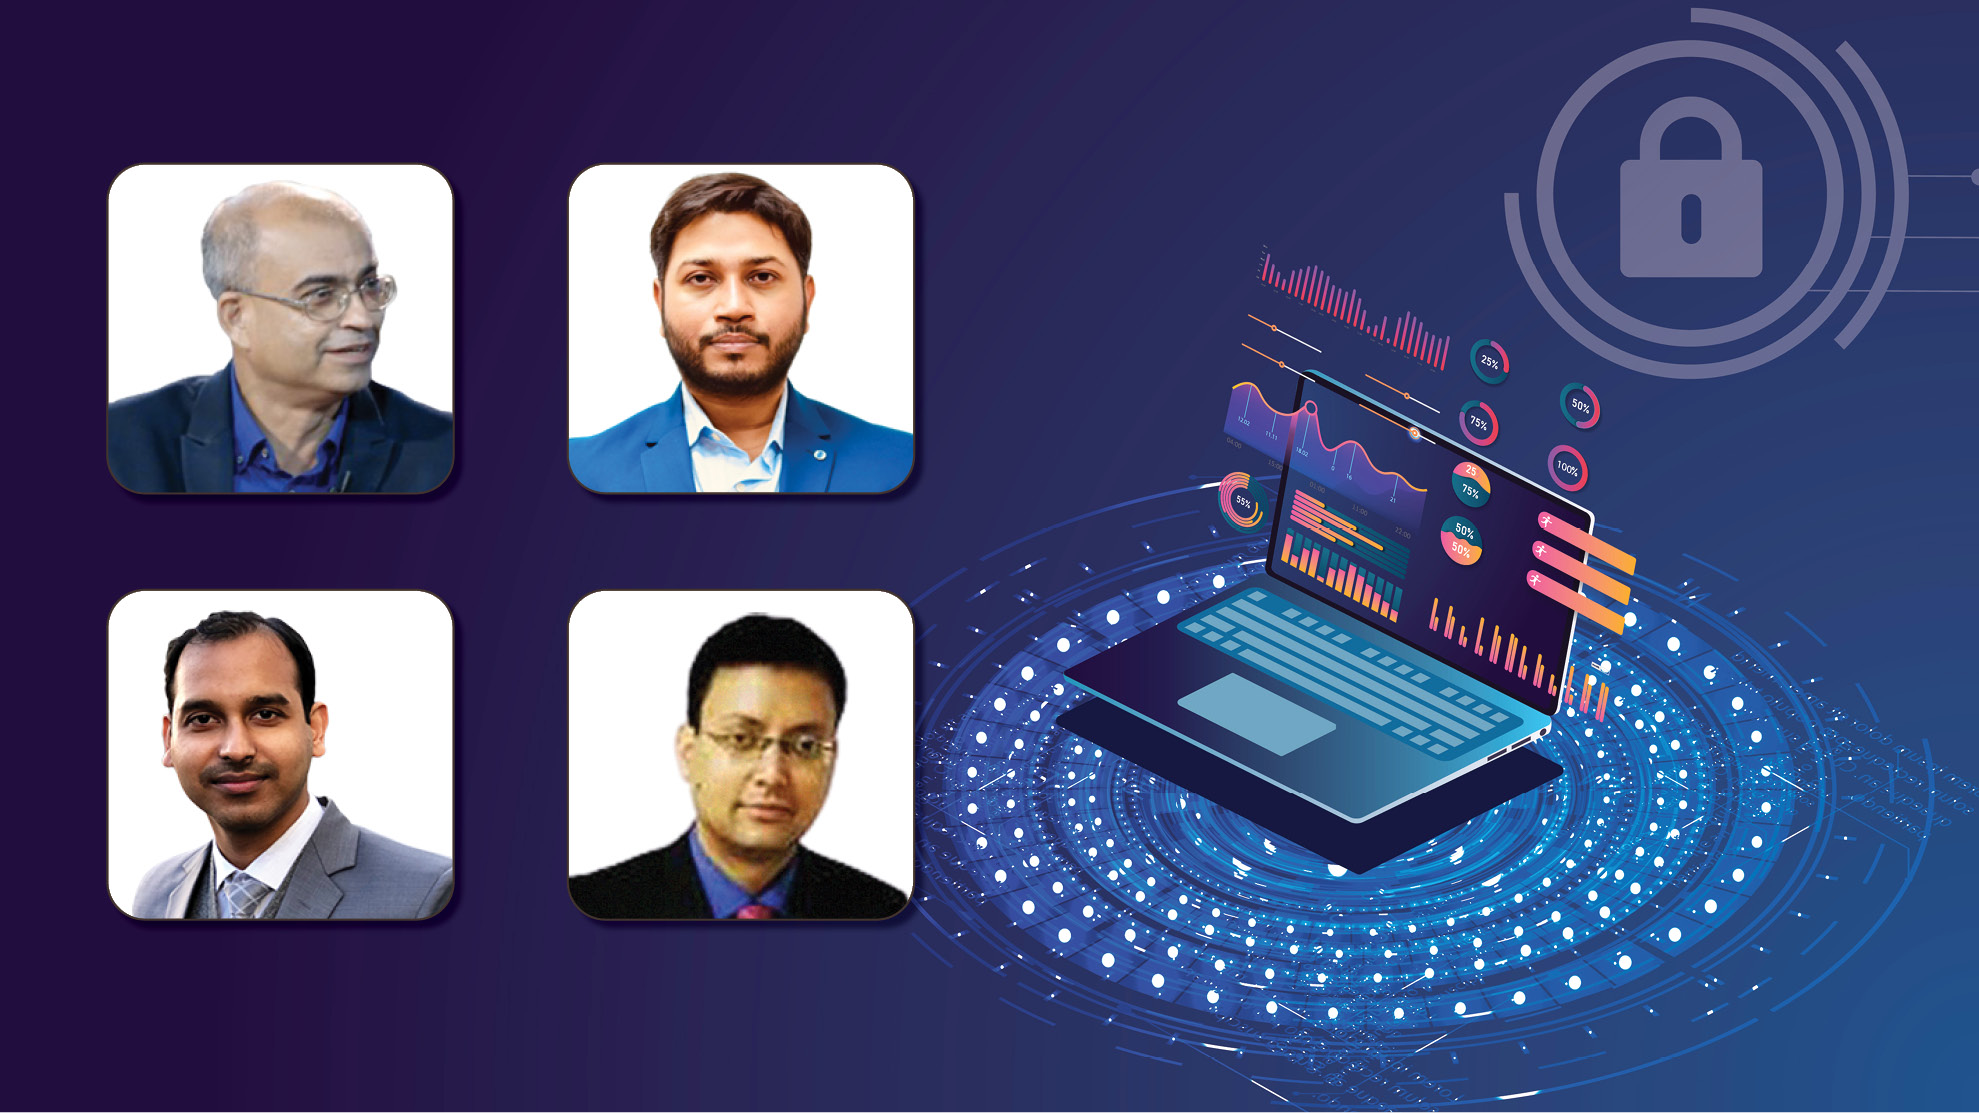 (First row, from left) Charanpreet Singh and Angshuman Ghosh. (Second row, from left) Sharath Ghosh and Nirupam Sen (moderator).